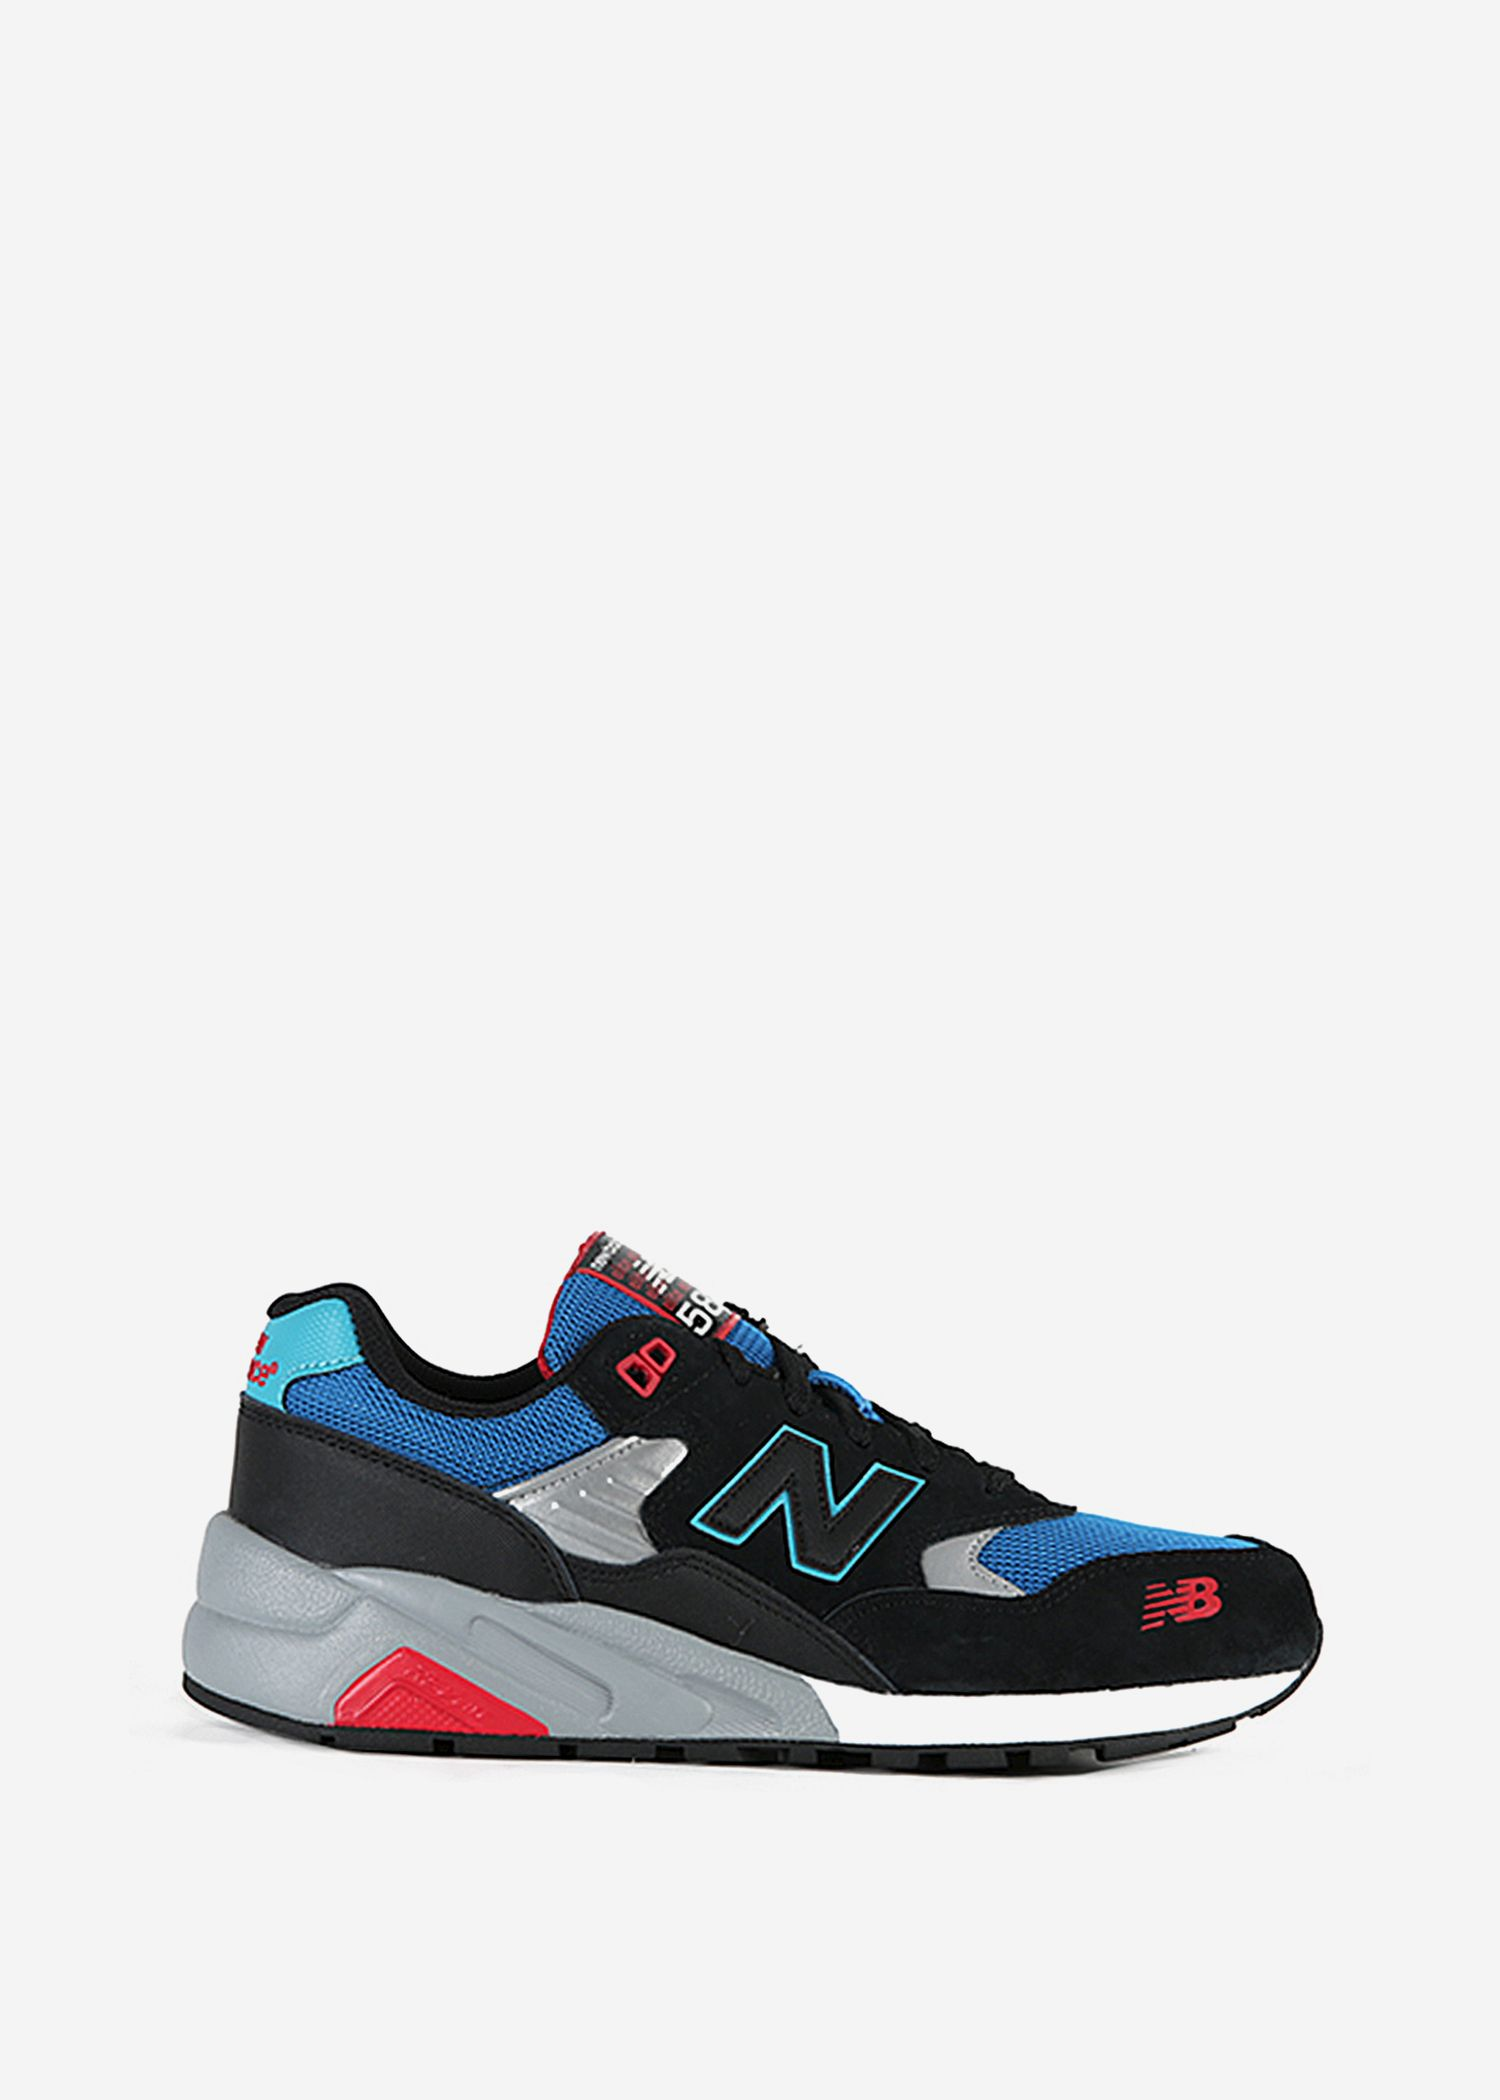 reputable site fe43f 47045 NEW BALANCE MRT580BF. #newbalance #shoes | New Balance in ...